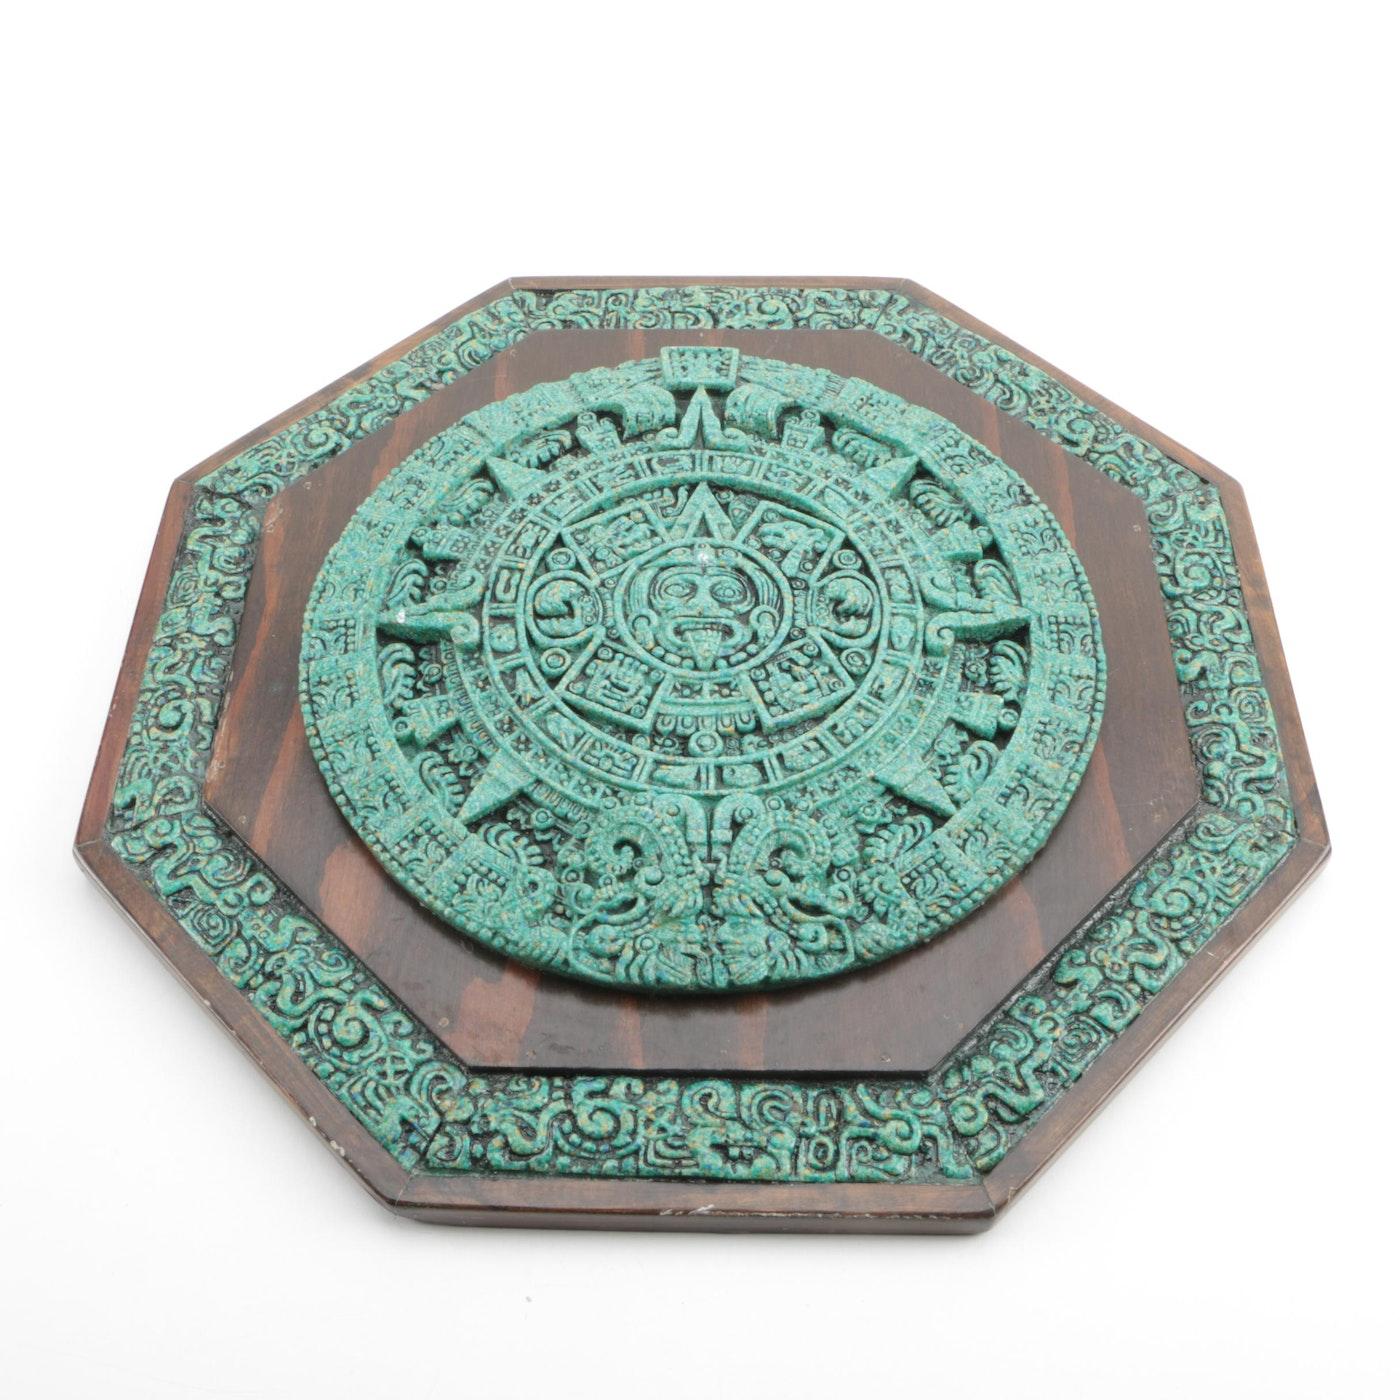 Aztec calender ceramic wall decor ebth for Aztec decoration